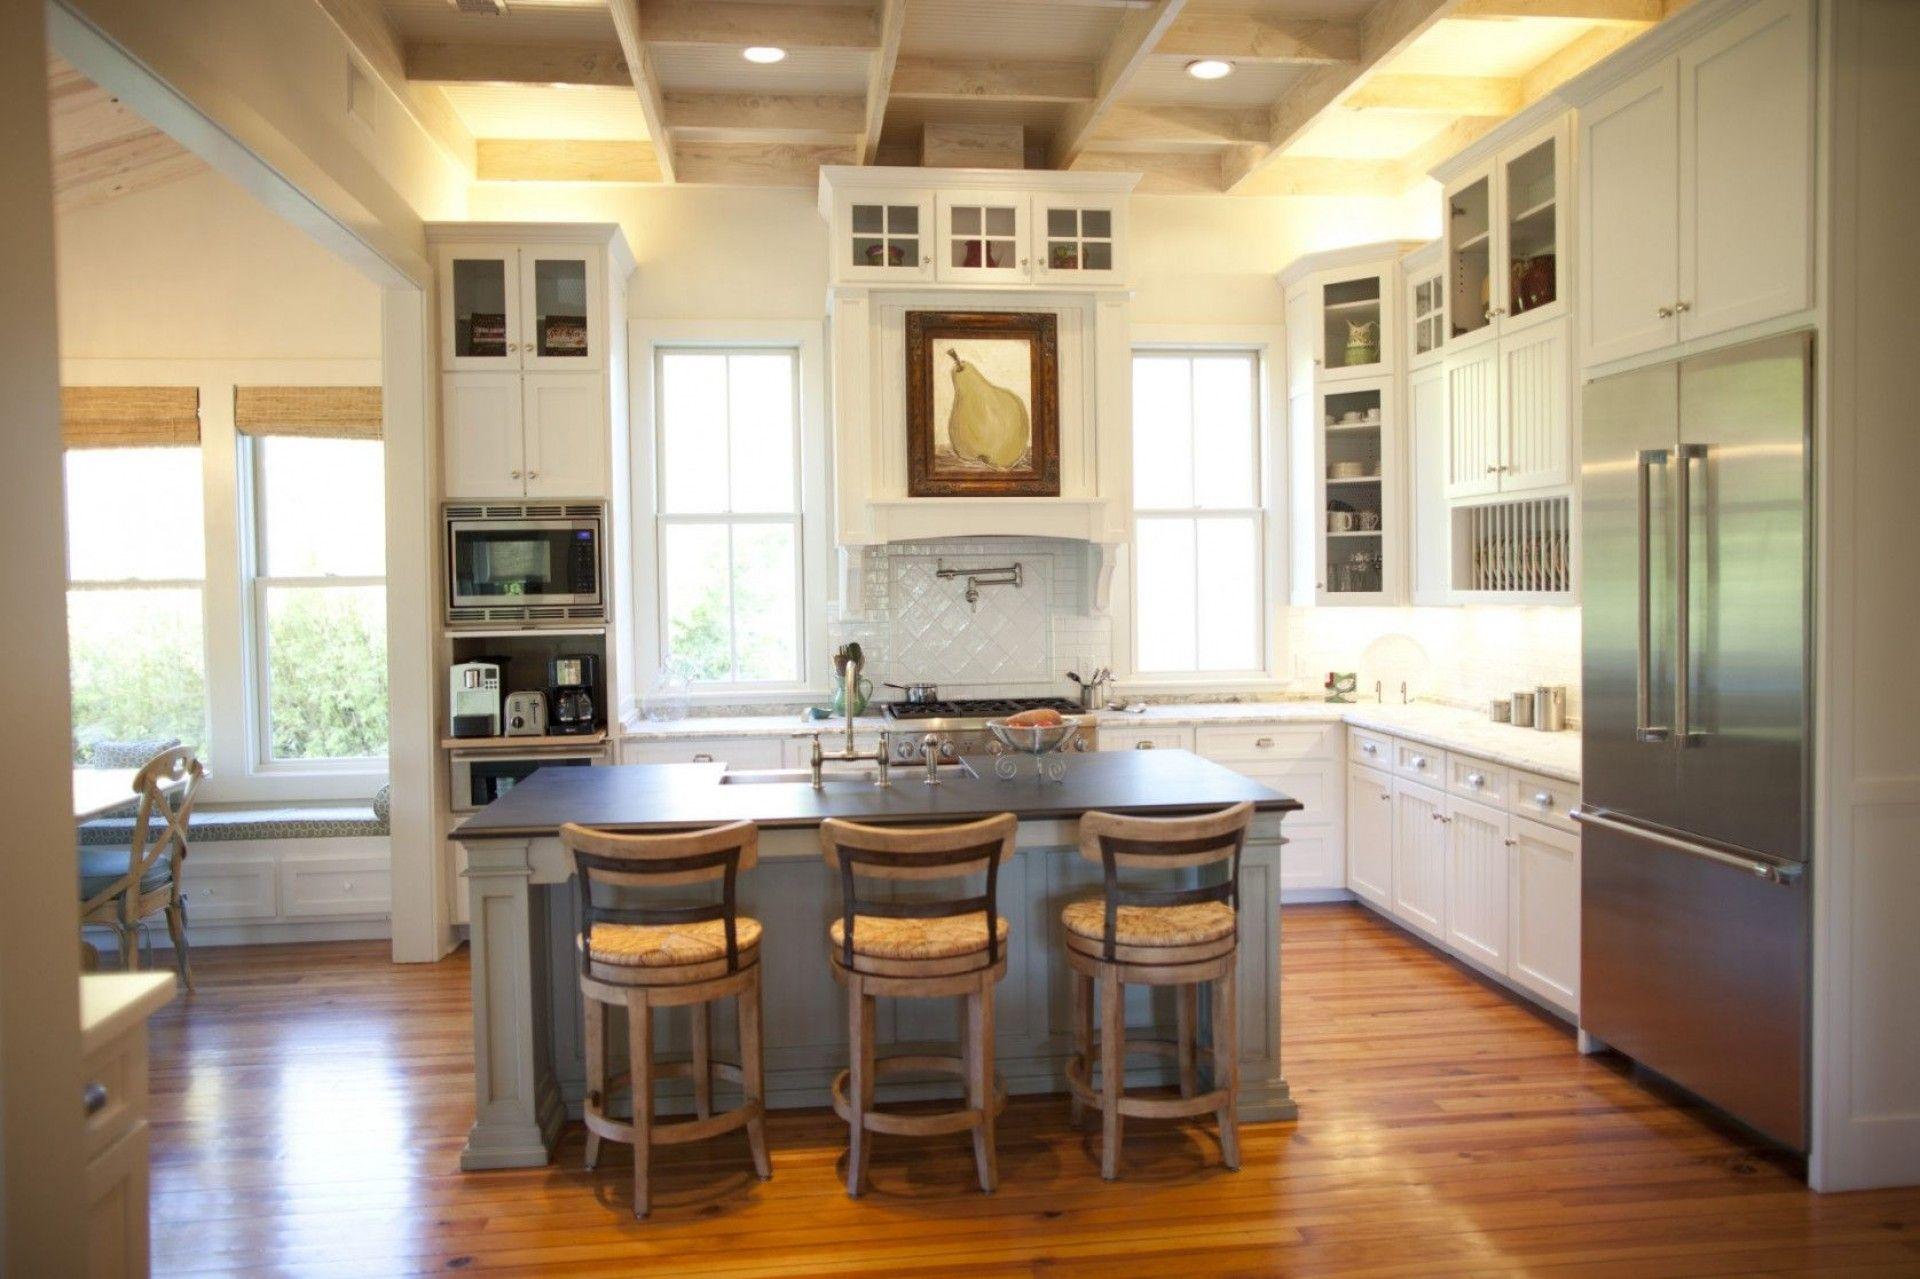 End on corner upper. Kitchens without upper